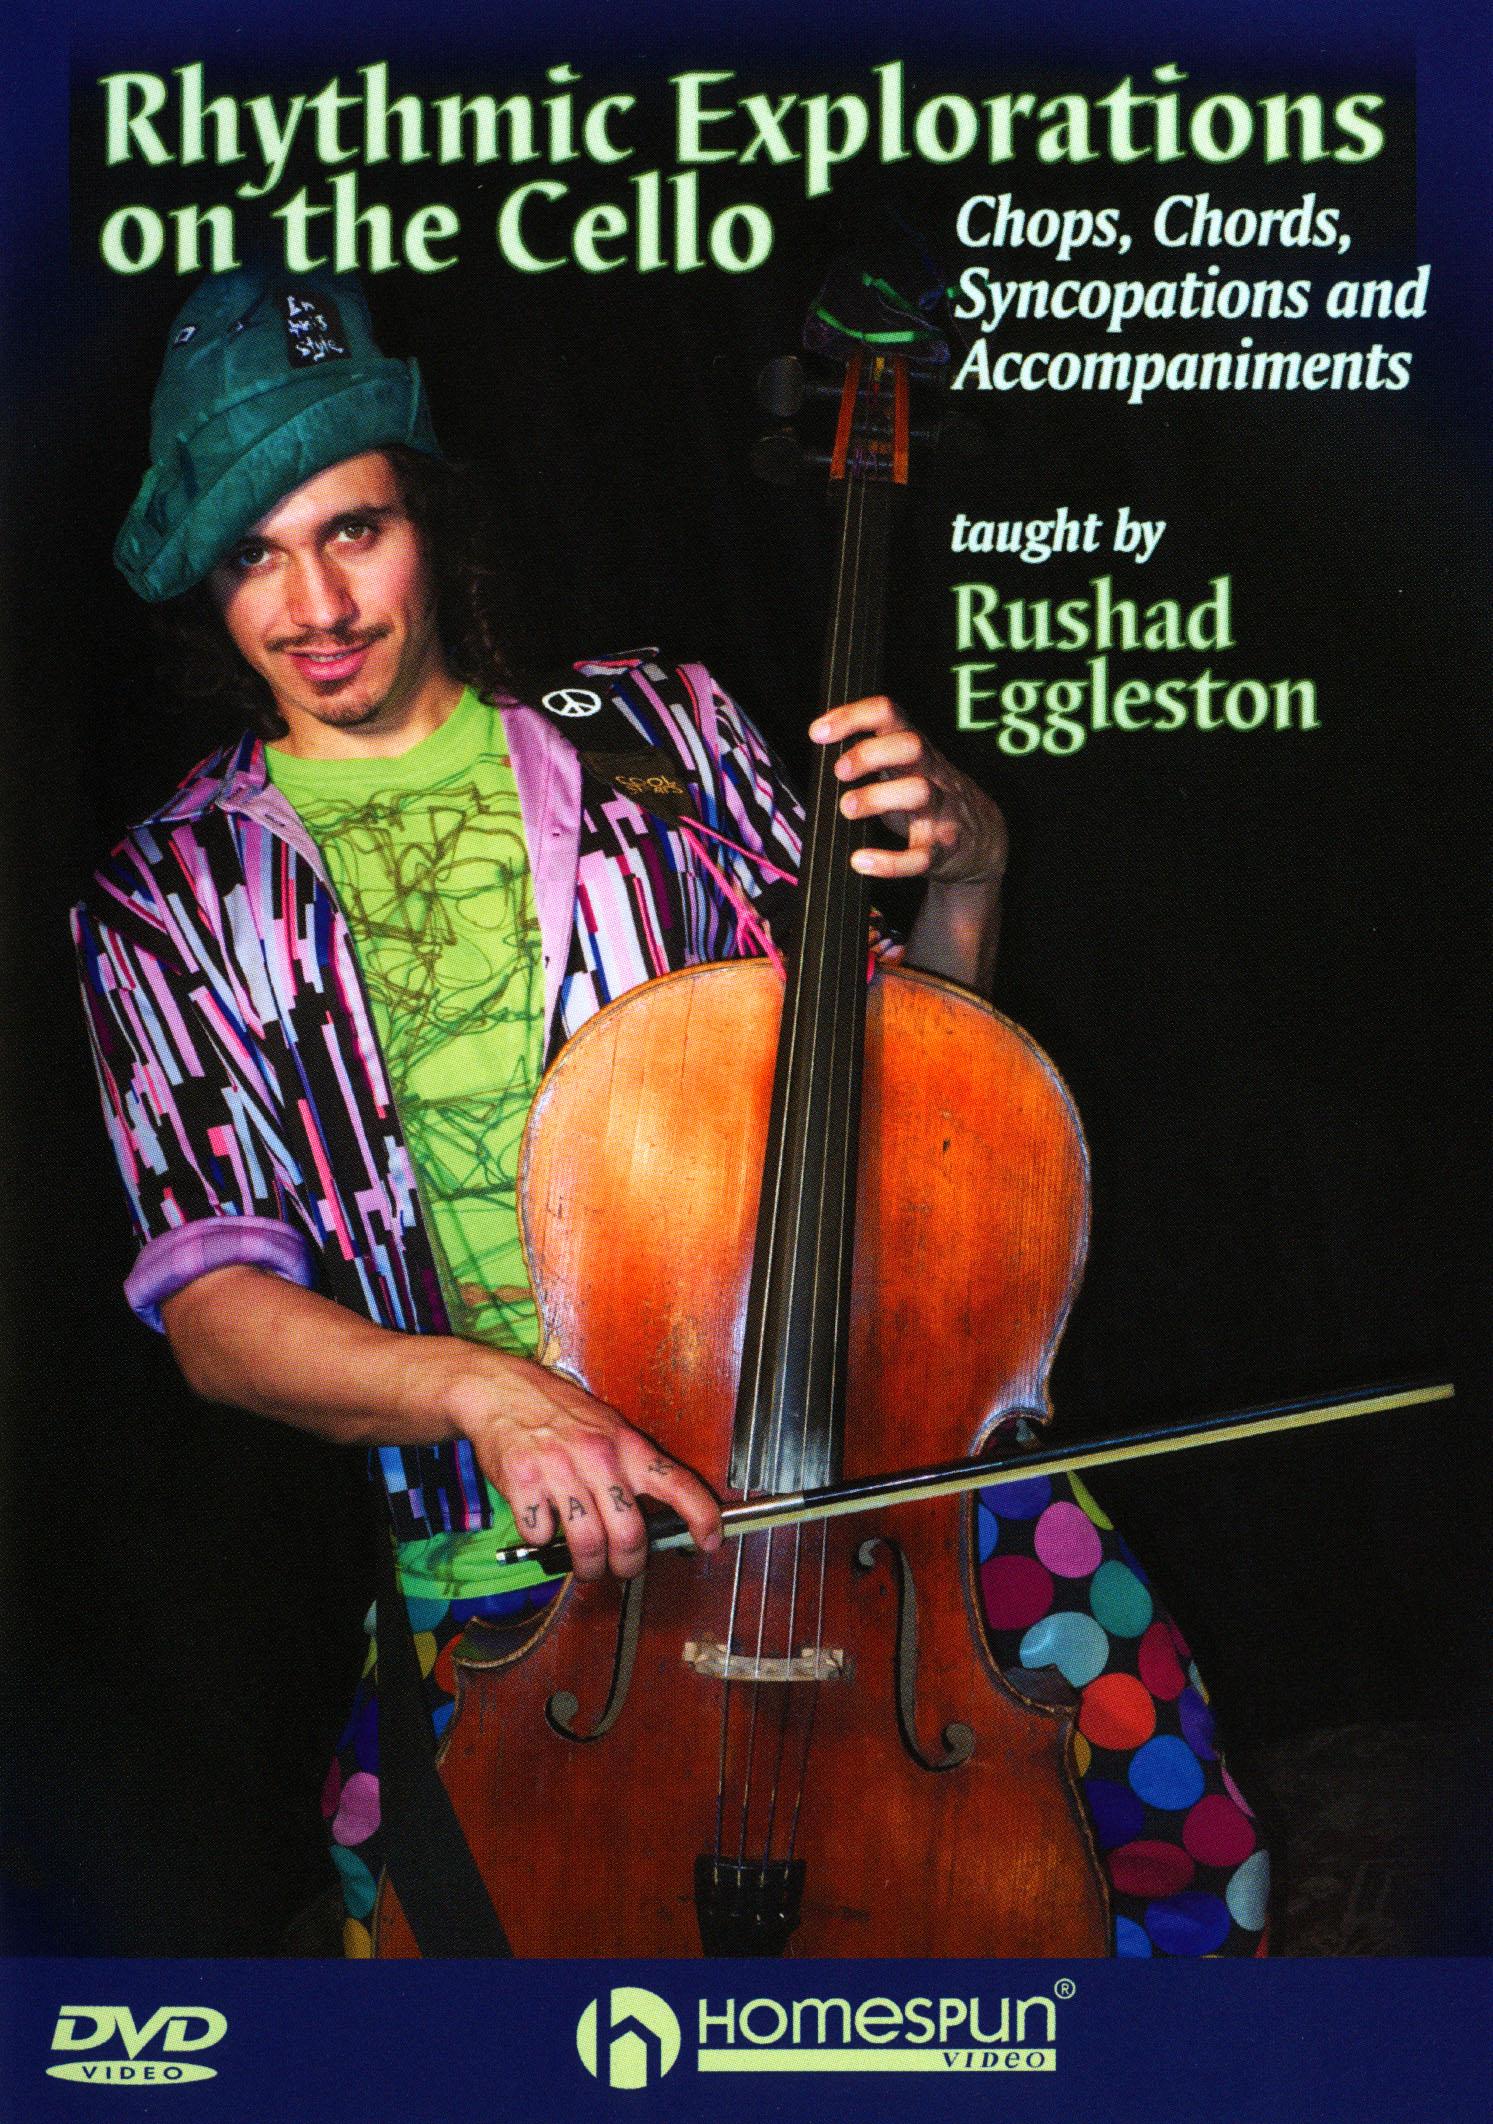 Rushad Eggleston: Rhythmic Explorations on the Cello